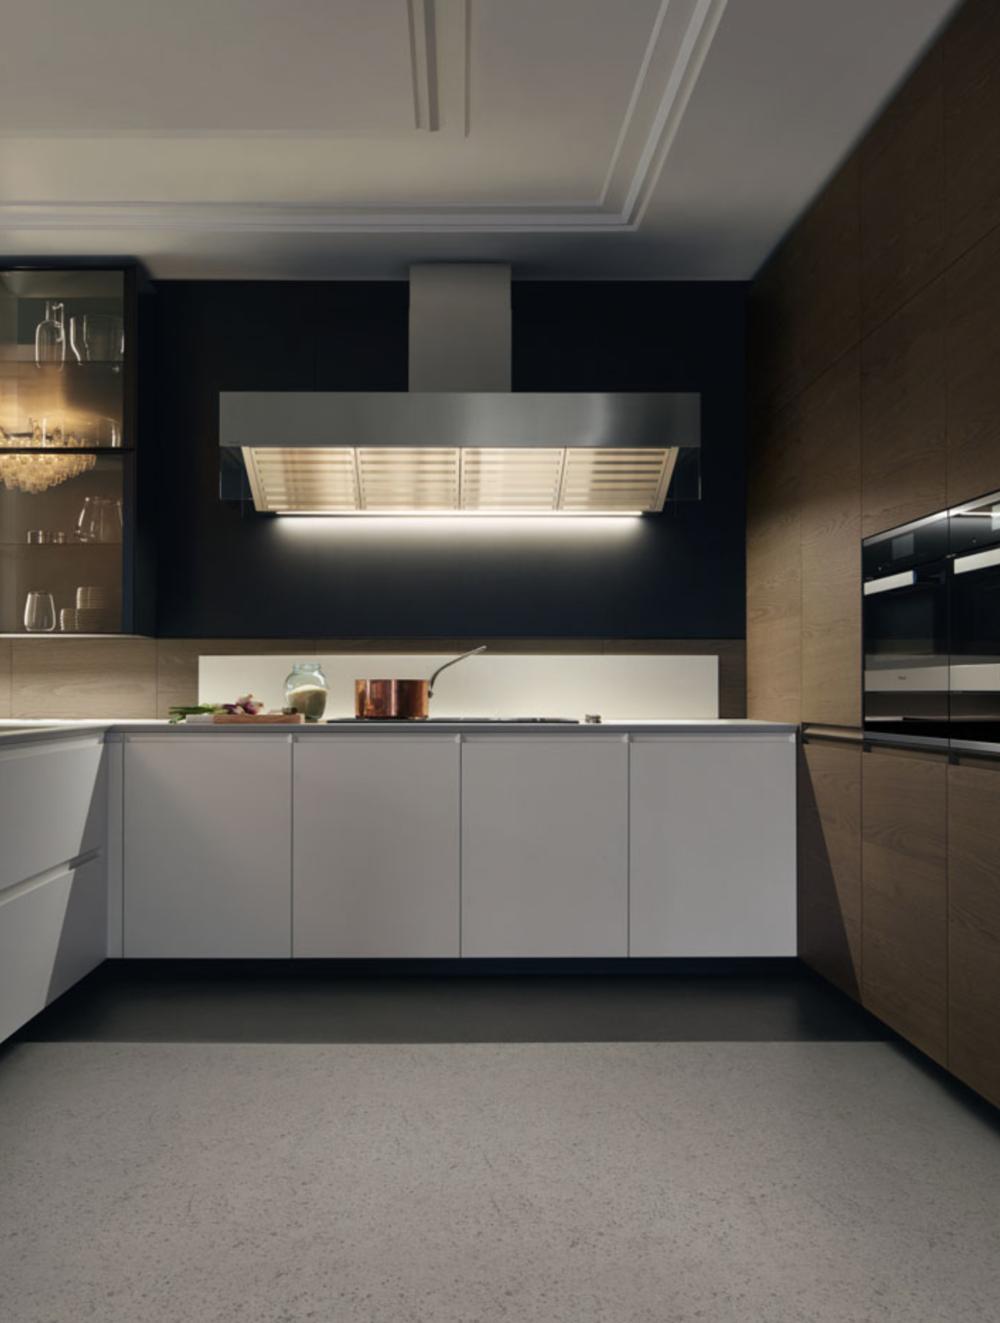 varenna — loncin interieur | a beautiful home, Deco ideeën